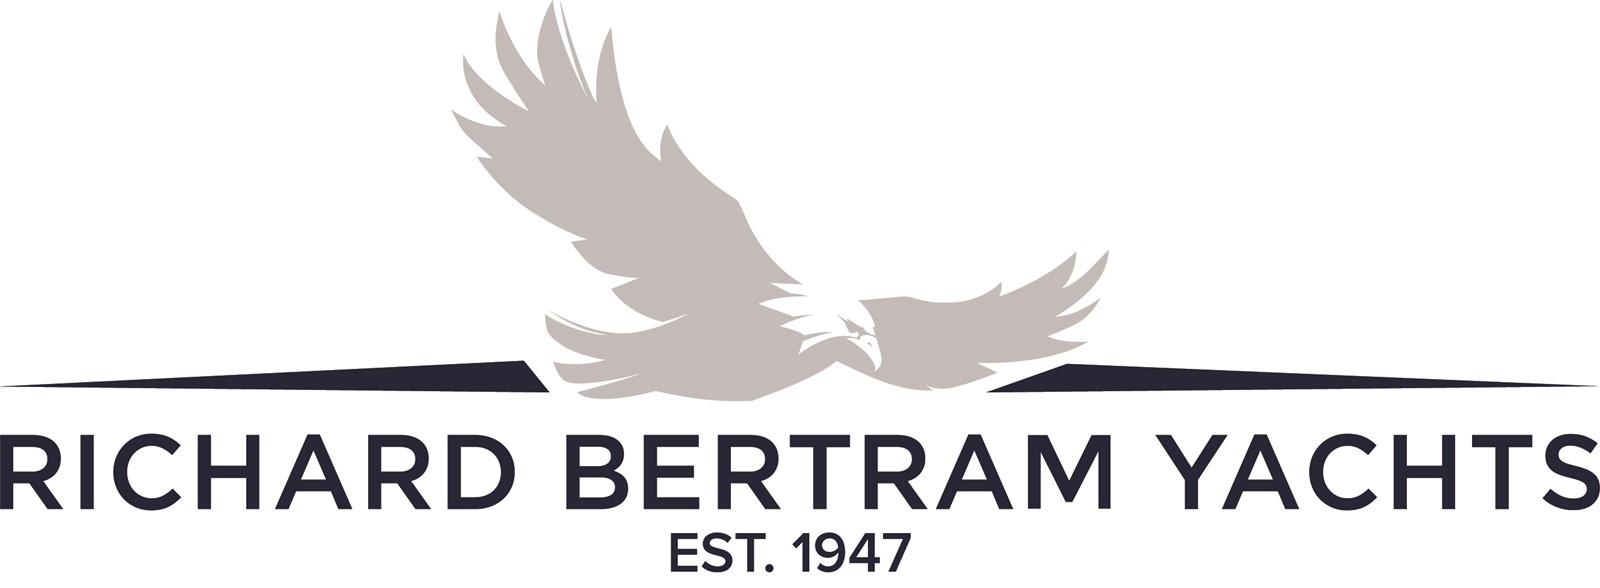 Richard Bertram Yachts